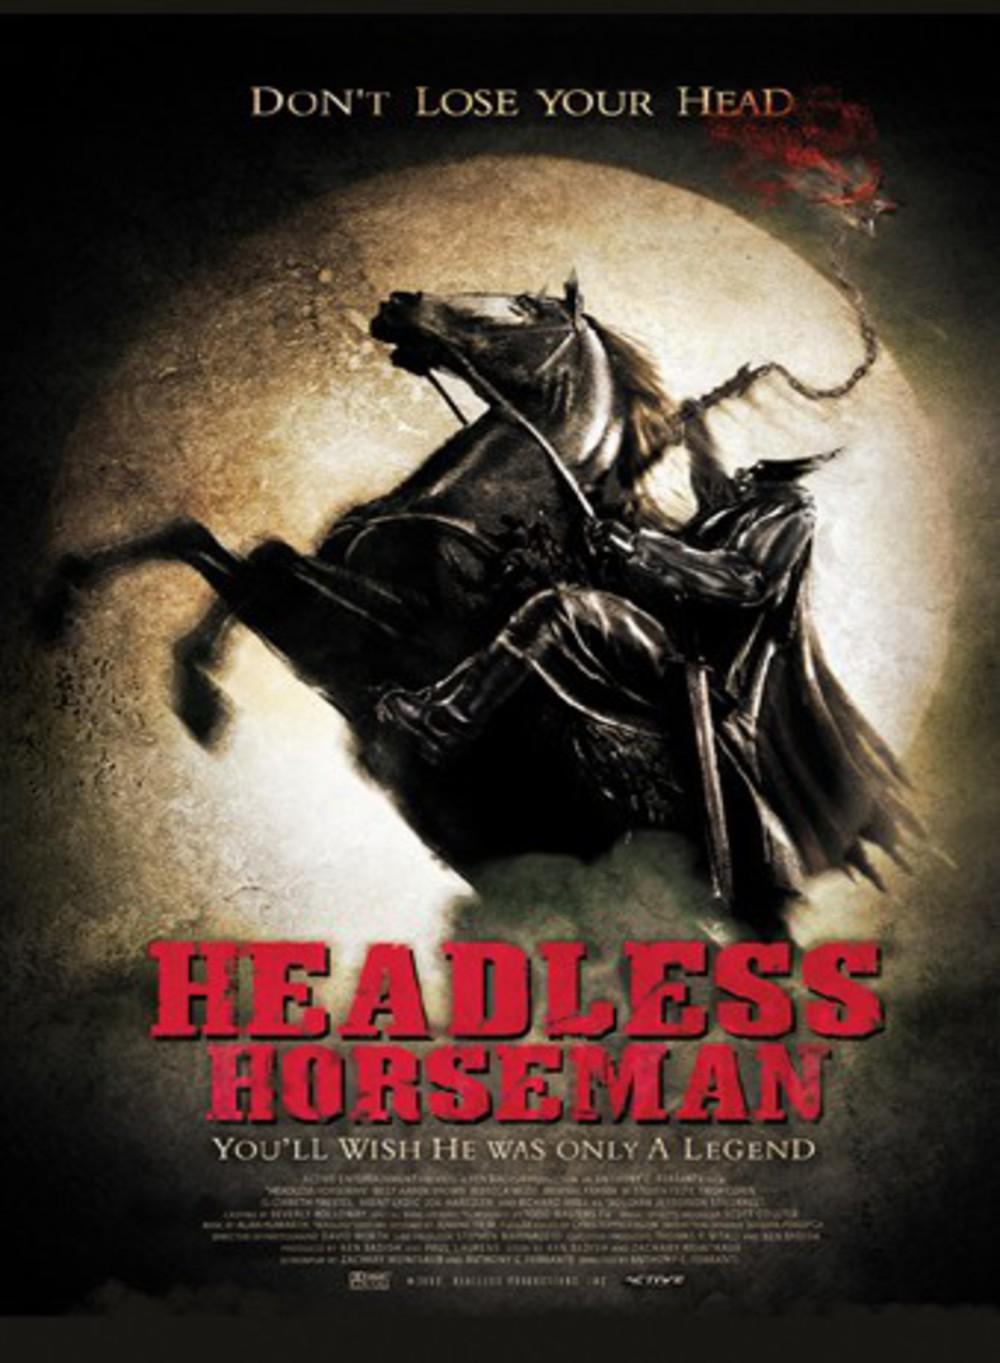 Headless Horseman (2007) ταινιες online seires oipeirates greek subs